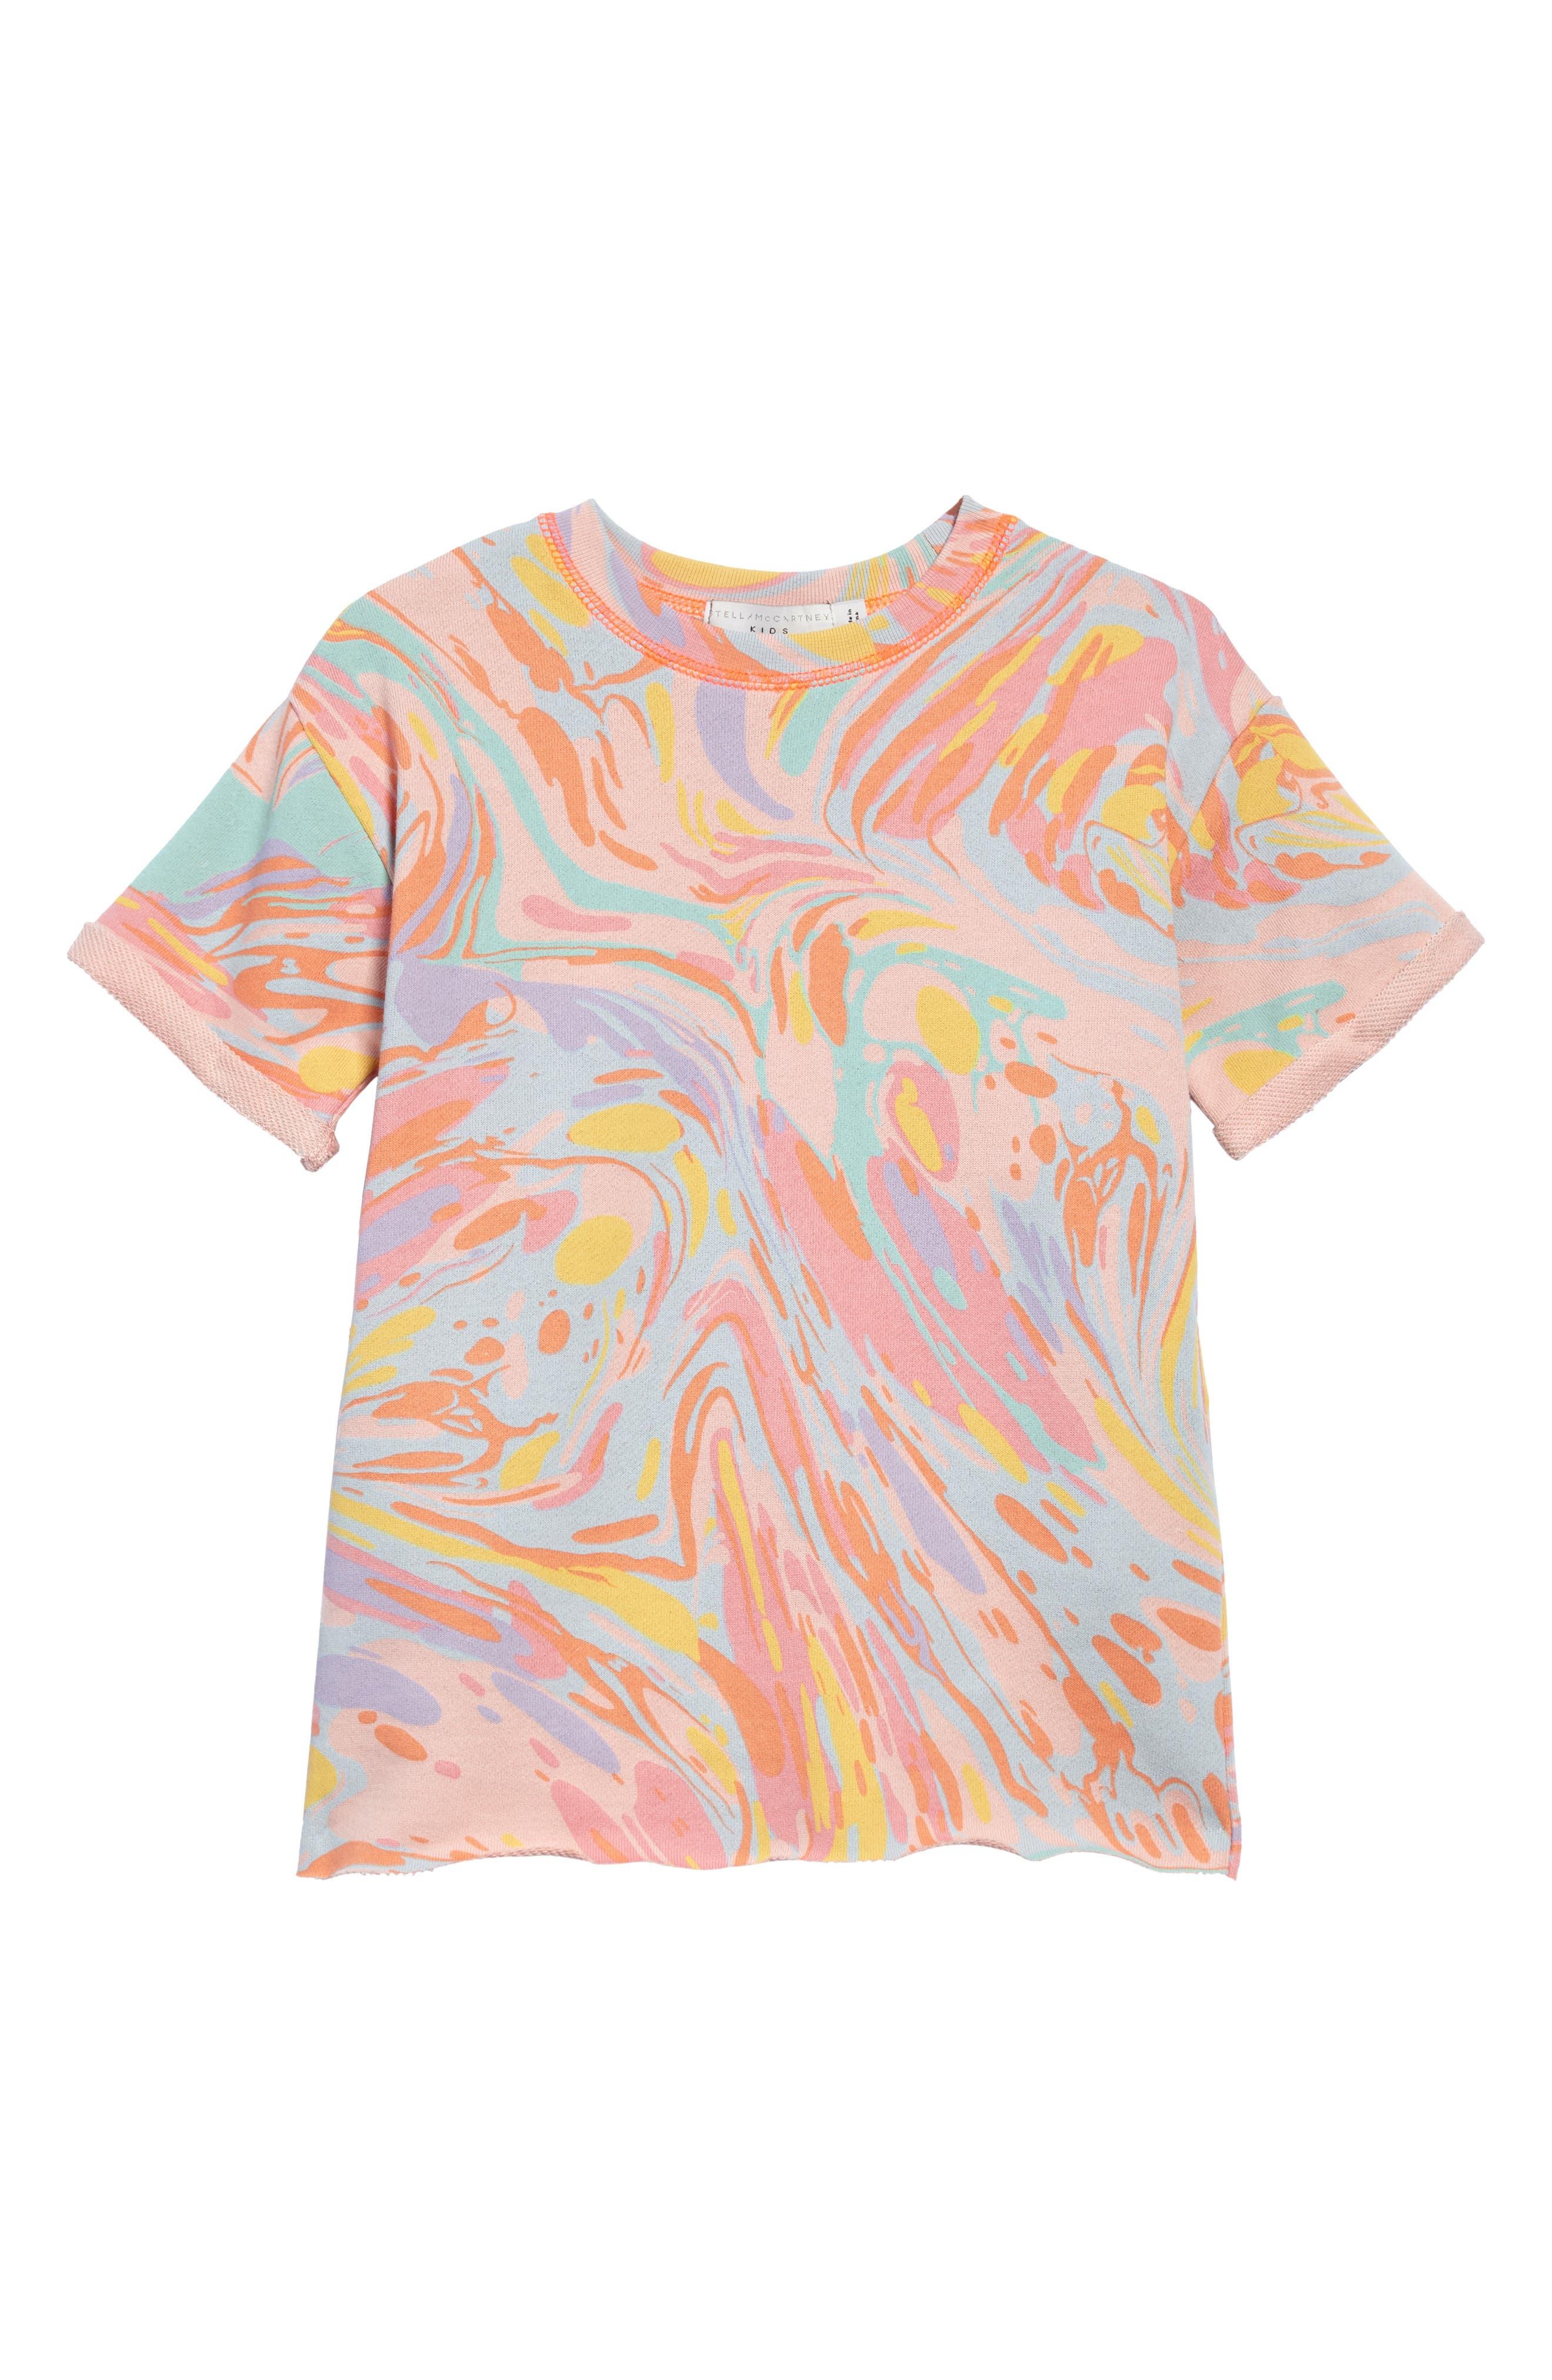 Stella McCartney Kids Savannah Marble Print Dress (Toddler Girls, Little Girls & Big Girls)